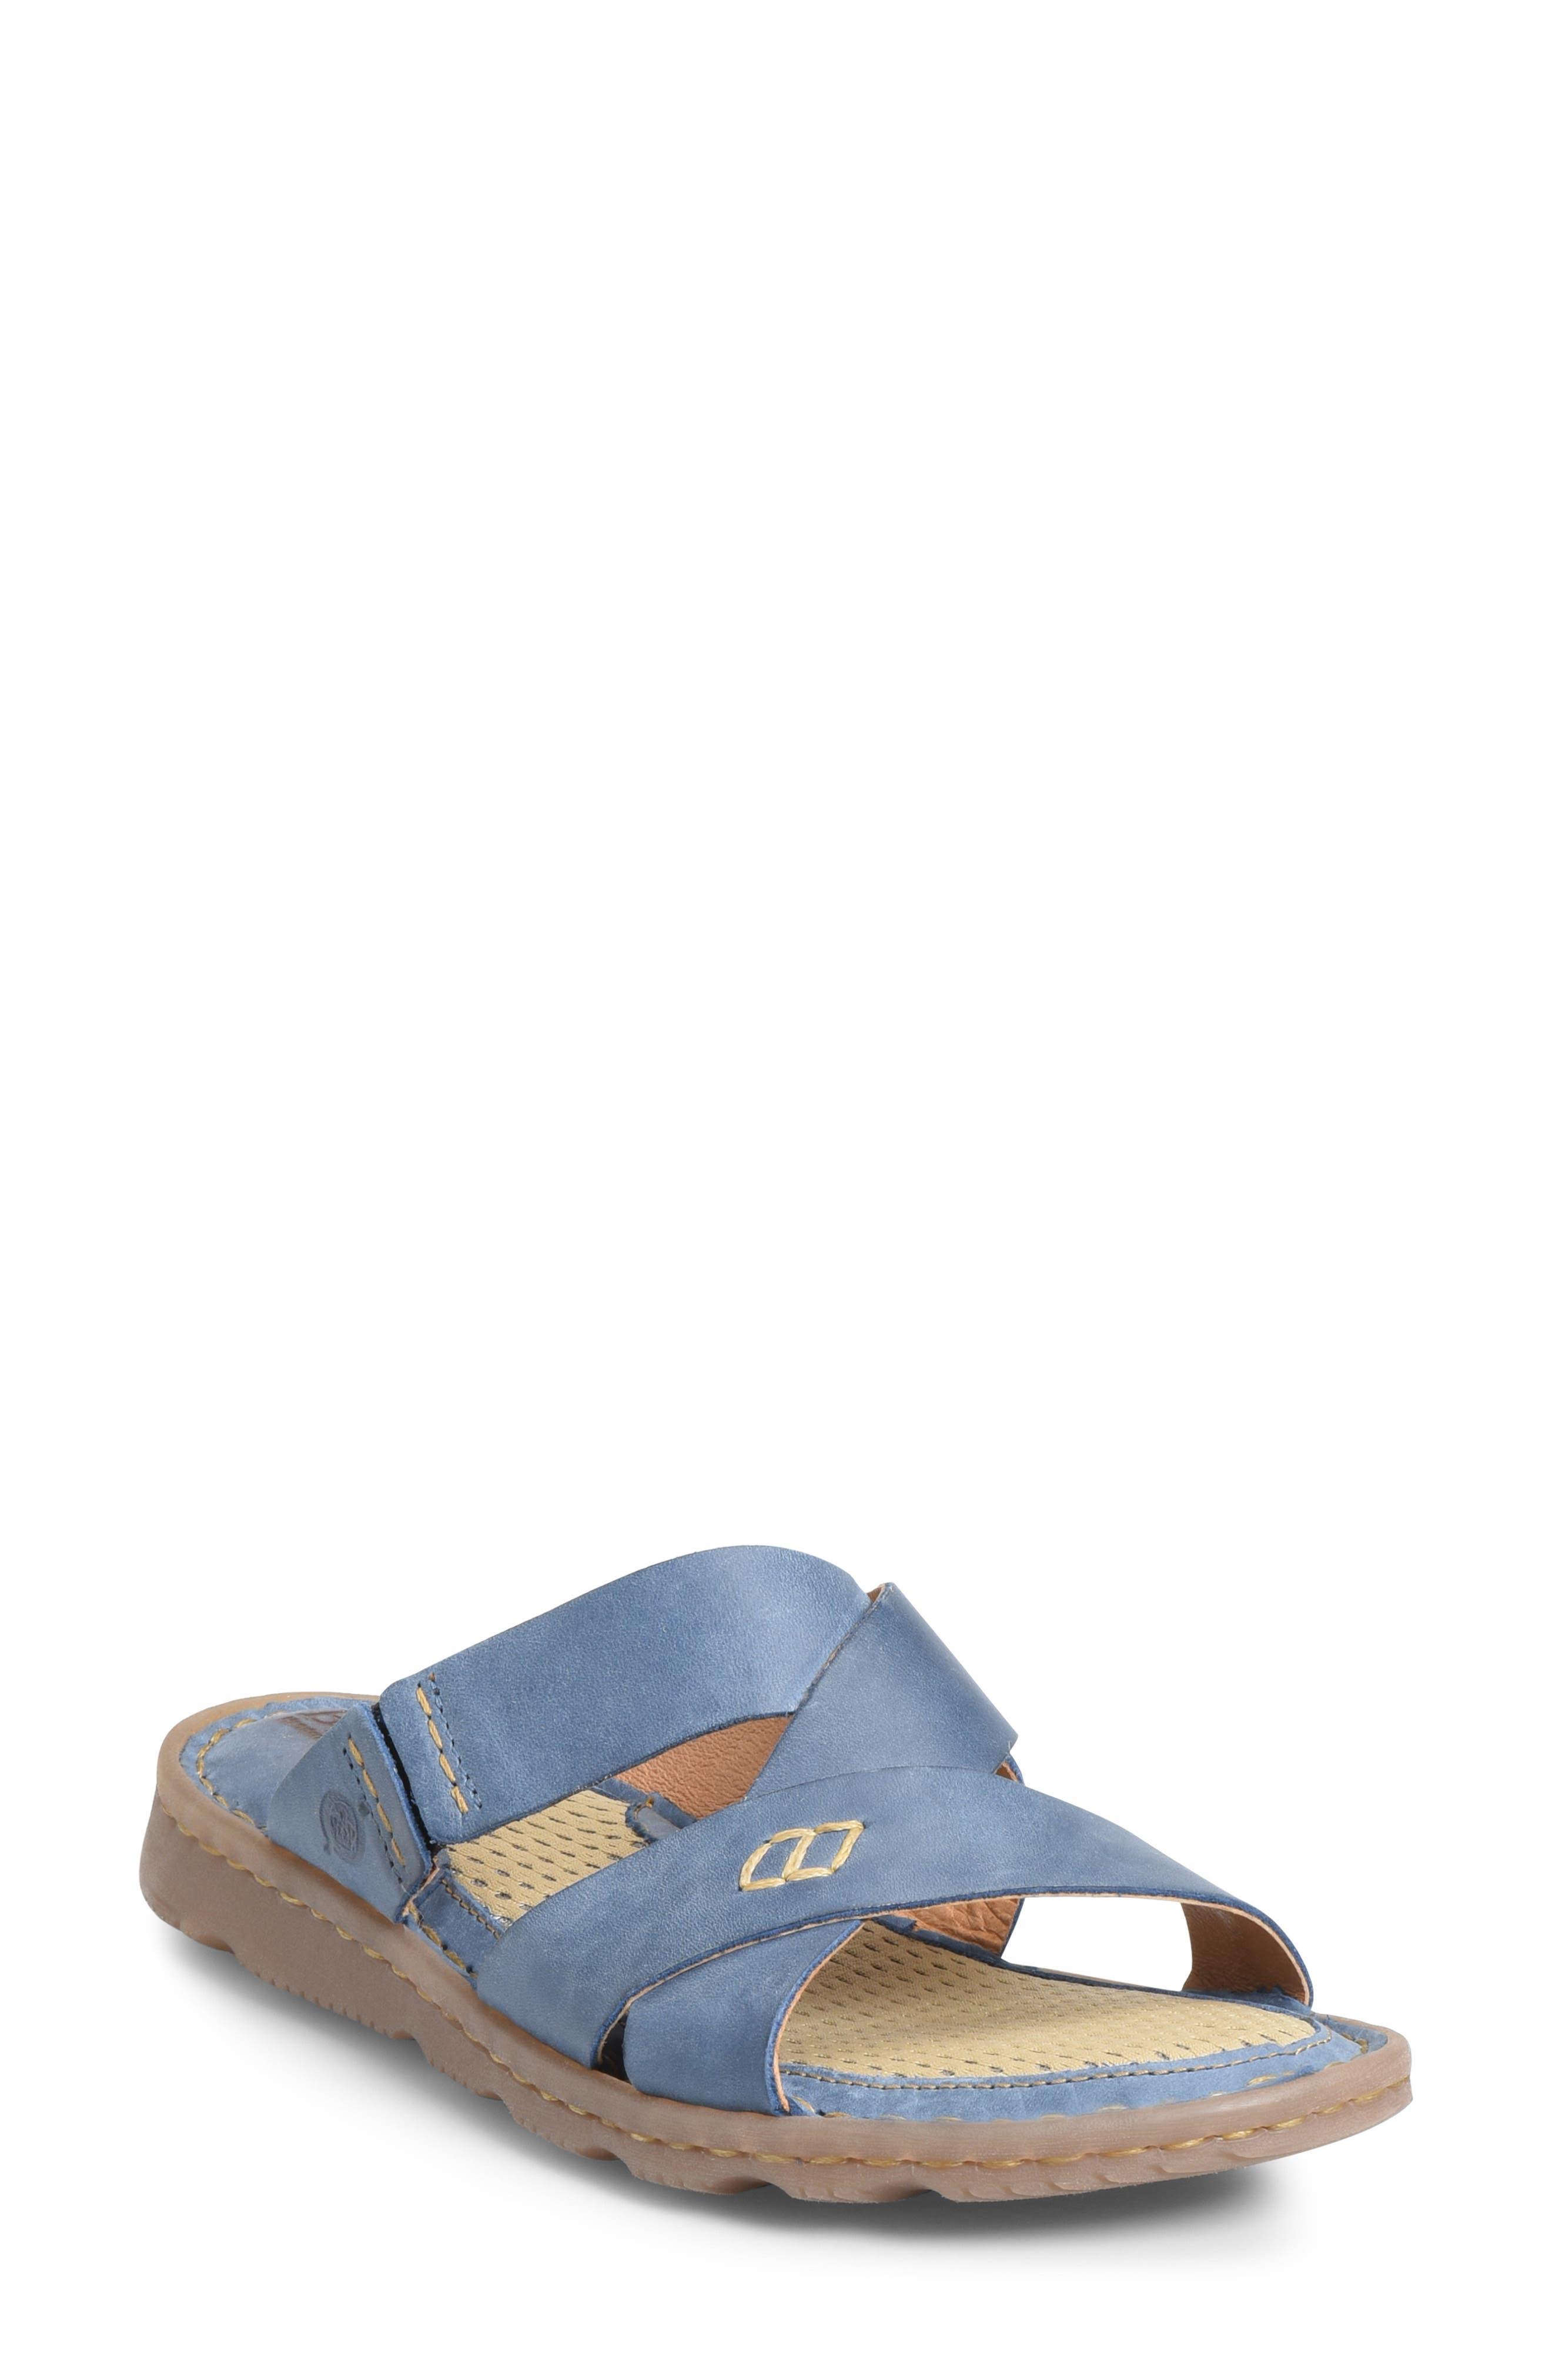 B?rn Hayka Asymmetrical Slide Sandal, Blue